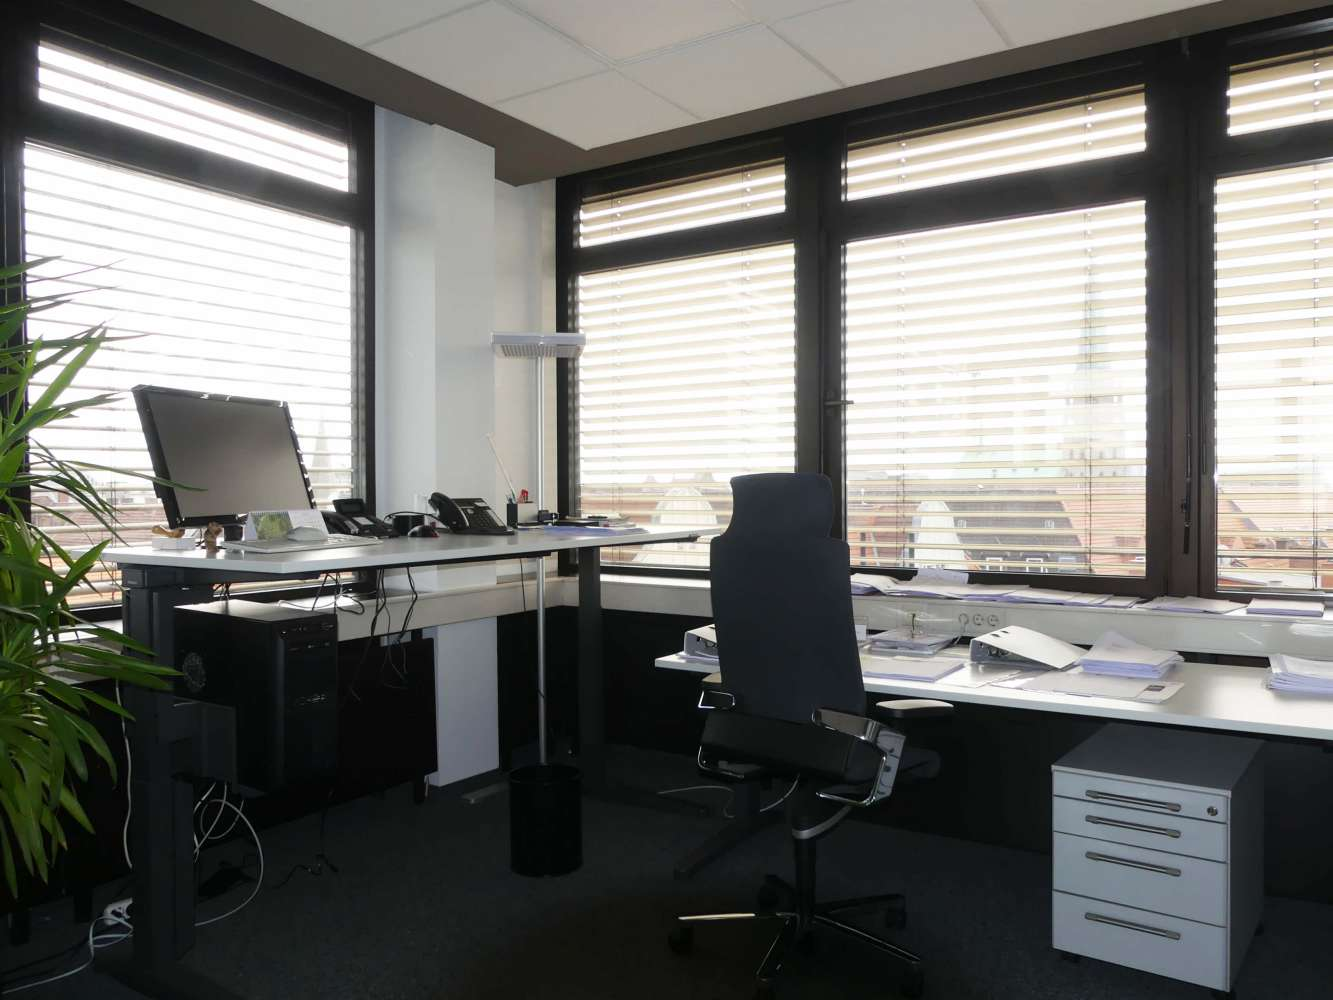 Büros Bielefeld, 33602 - Büro - Bielefeld, Innenstadt - H1486 - 10566485